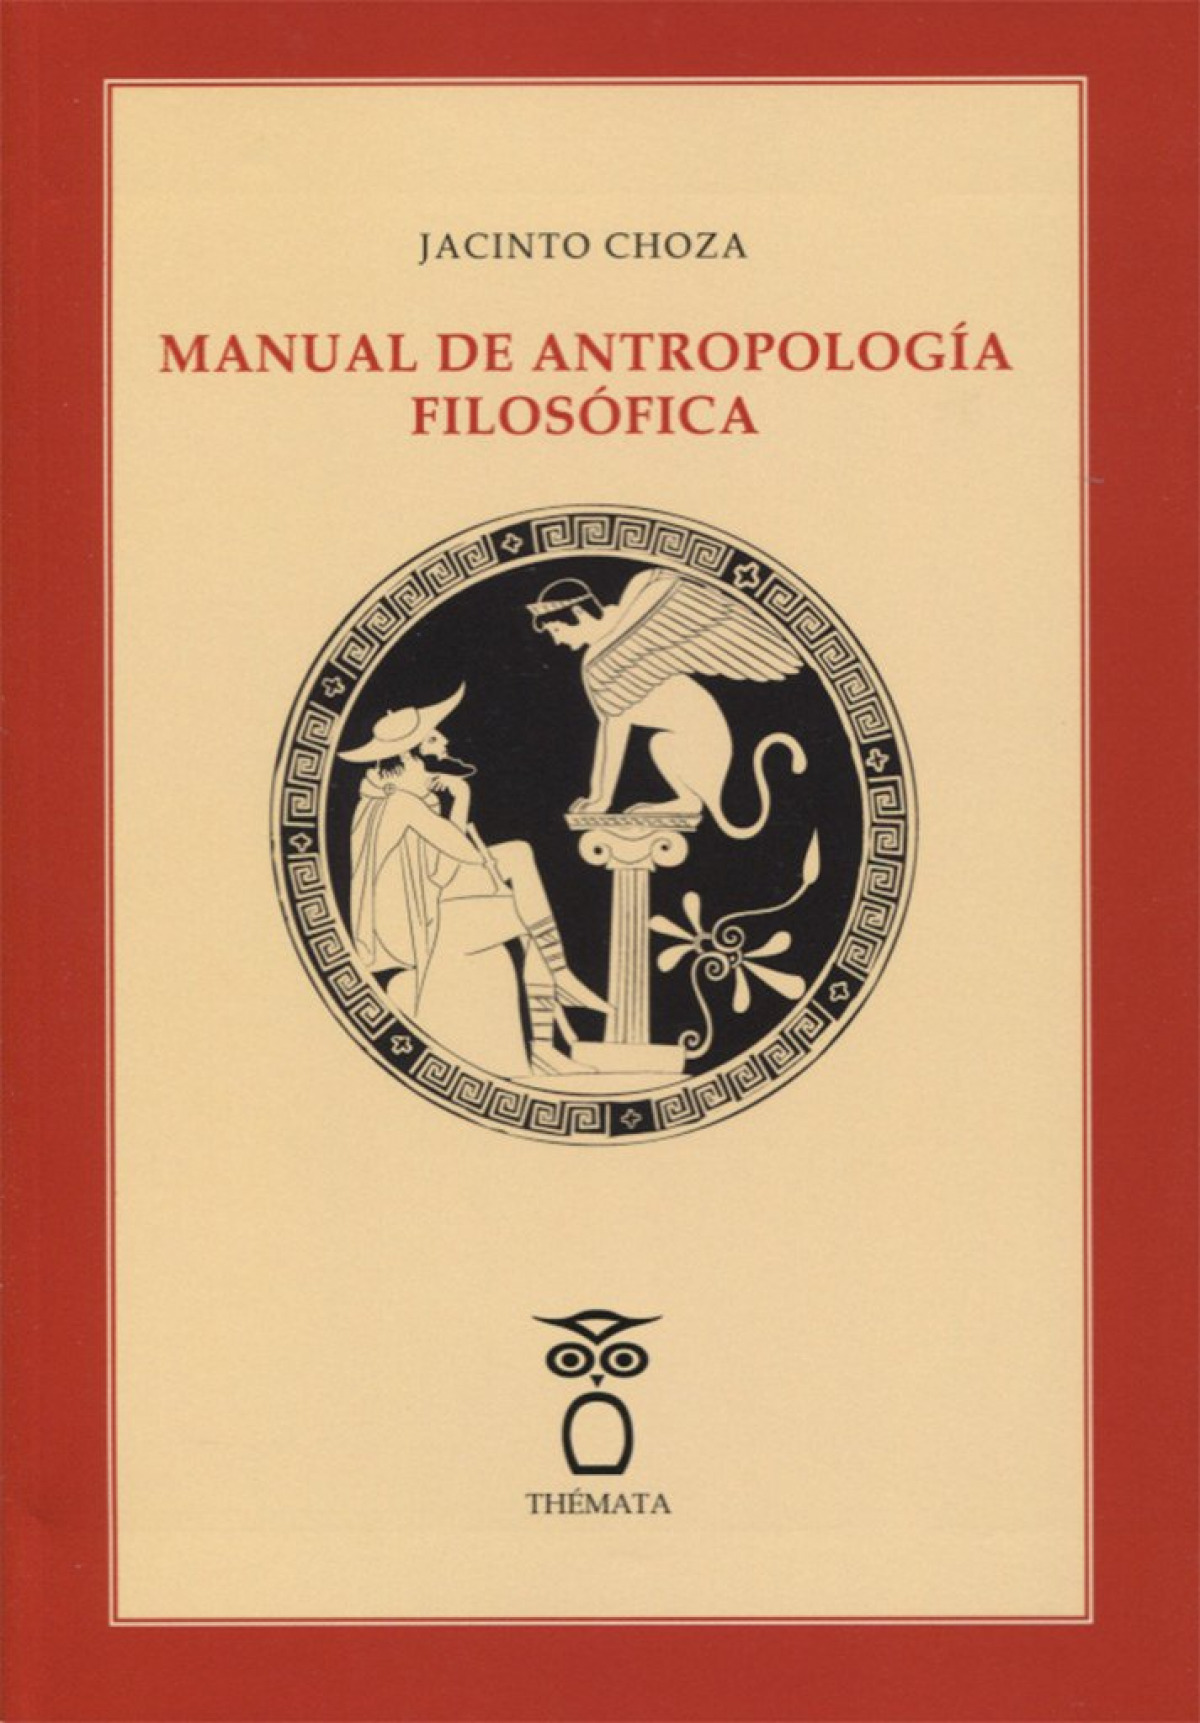 Manual de antropologia filosofica